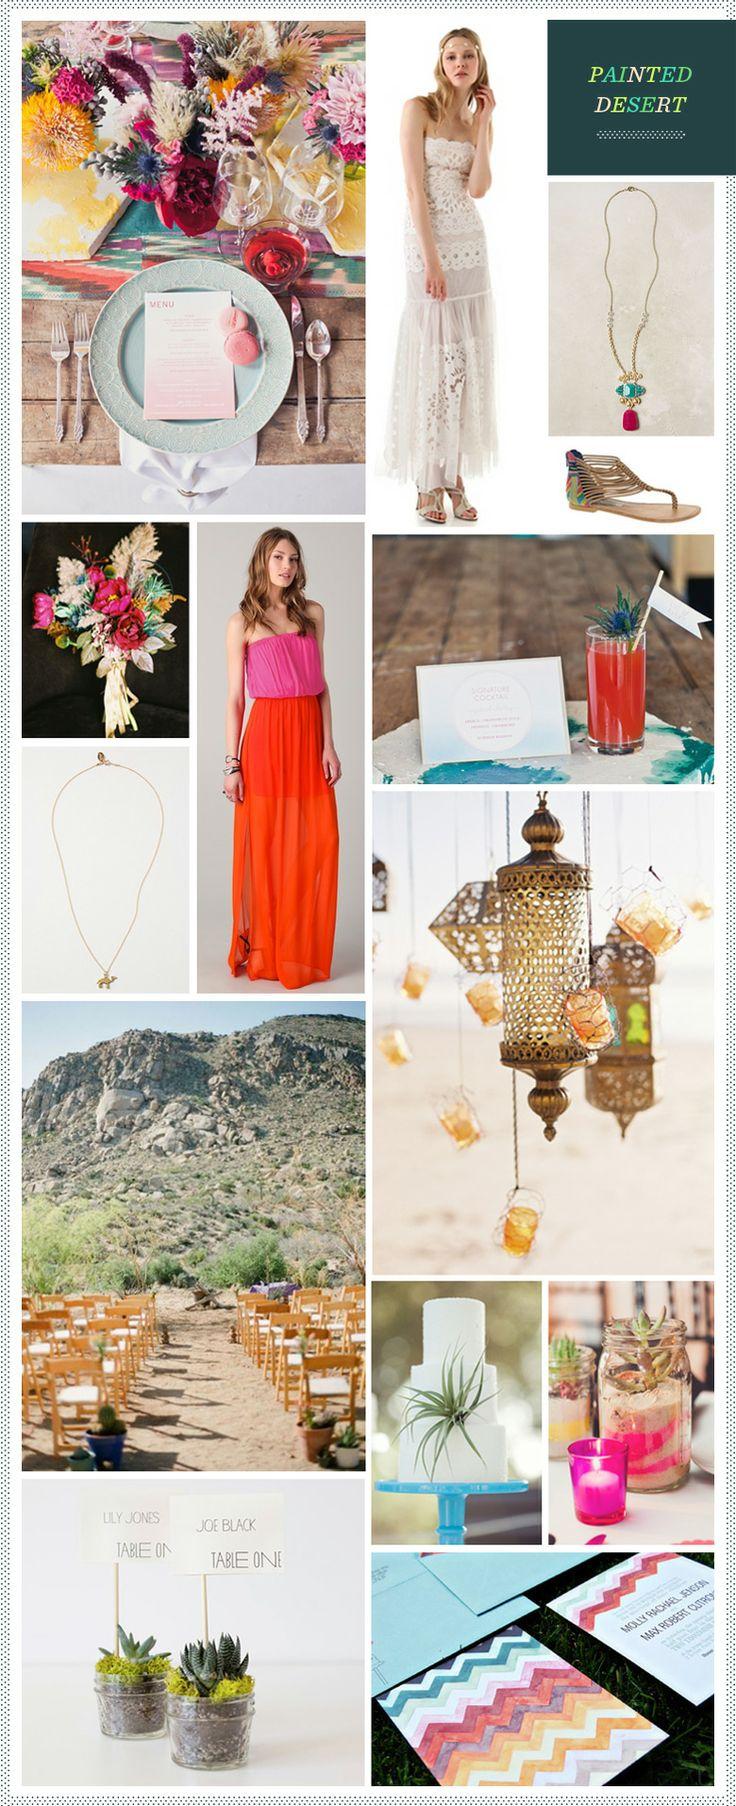 Painted Desert Wedding InspirationDesert Wedding, Wedding Inspiration, Dreams Wedding'S 3, Inspiration Boards, Belle, Colors Ideas, Painting Deserts, Bohemian Deserts, Deserts Wedding